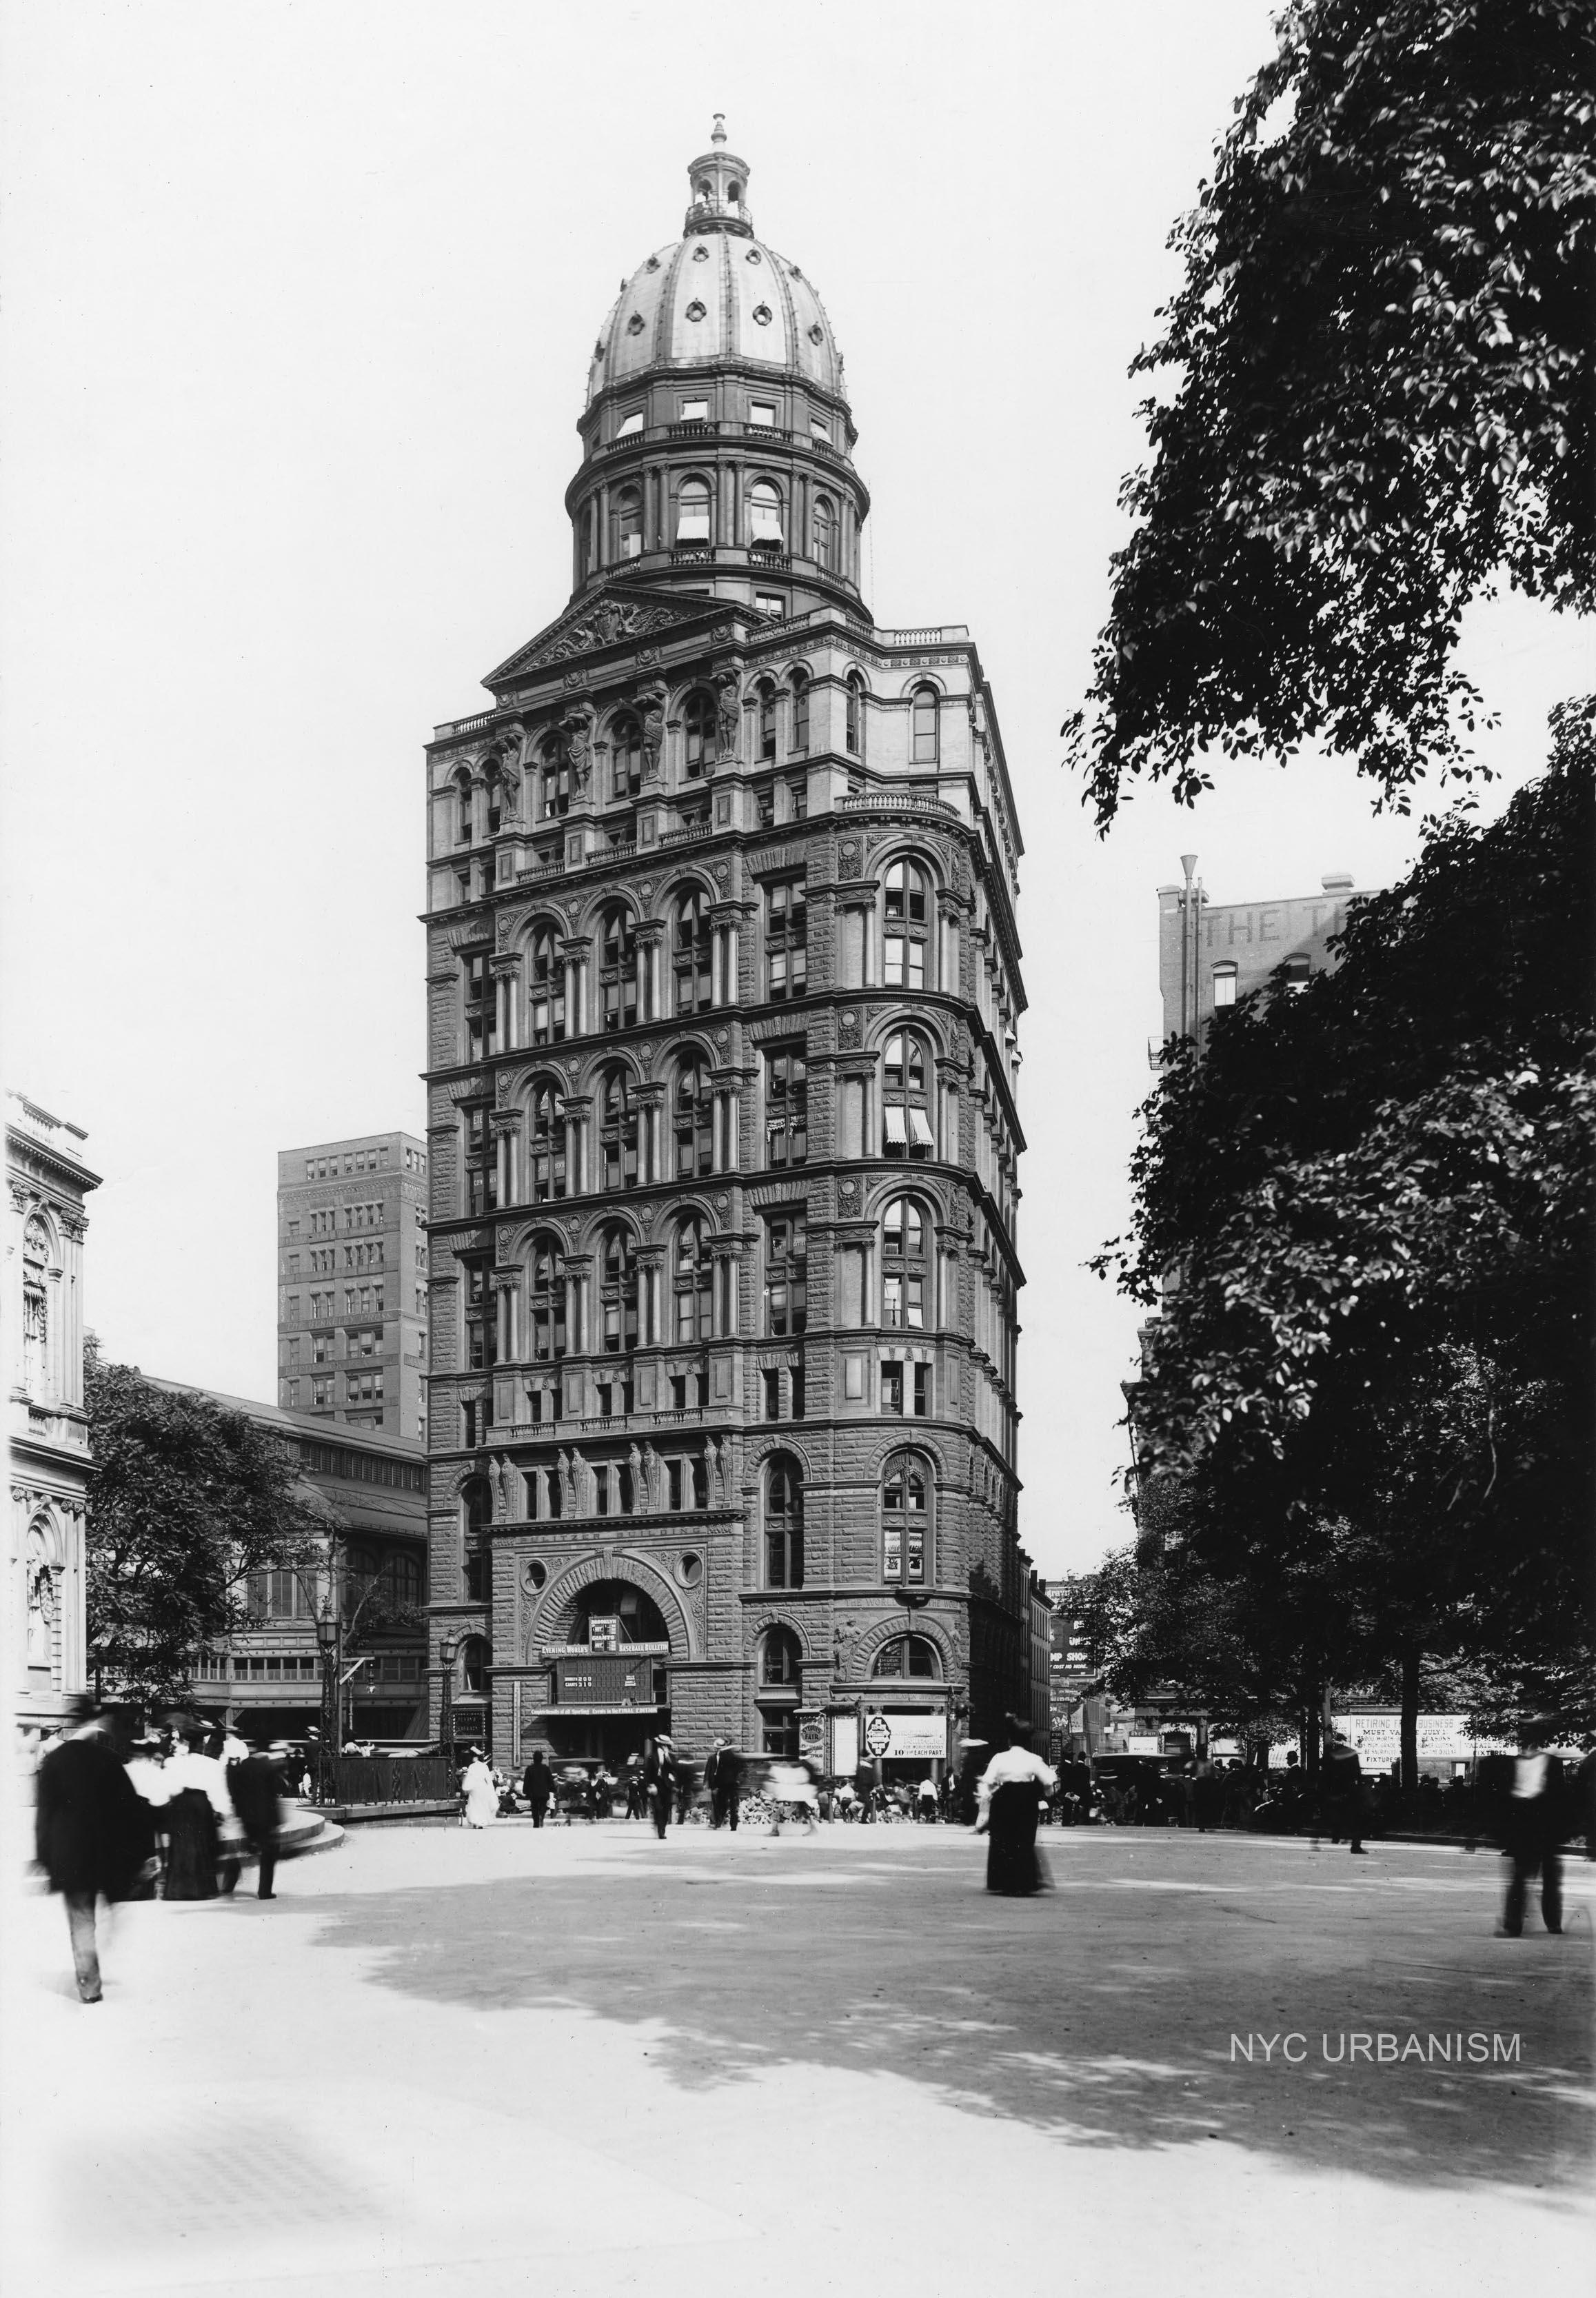 The World Building circa 1895.  Purchase a fine-art print here .